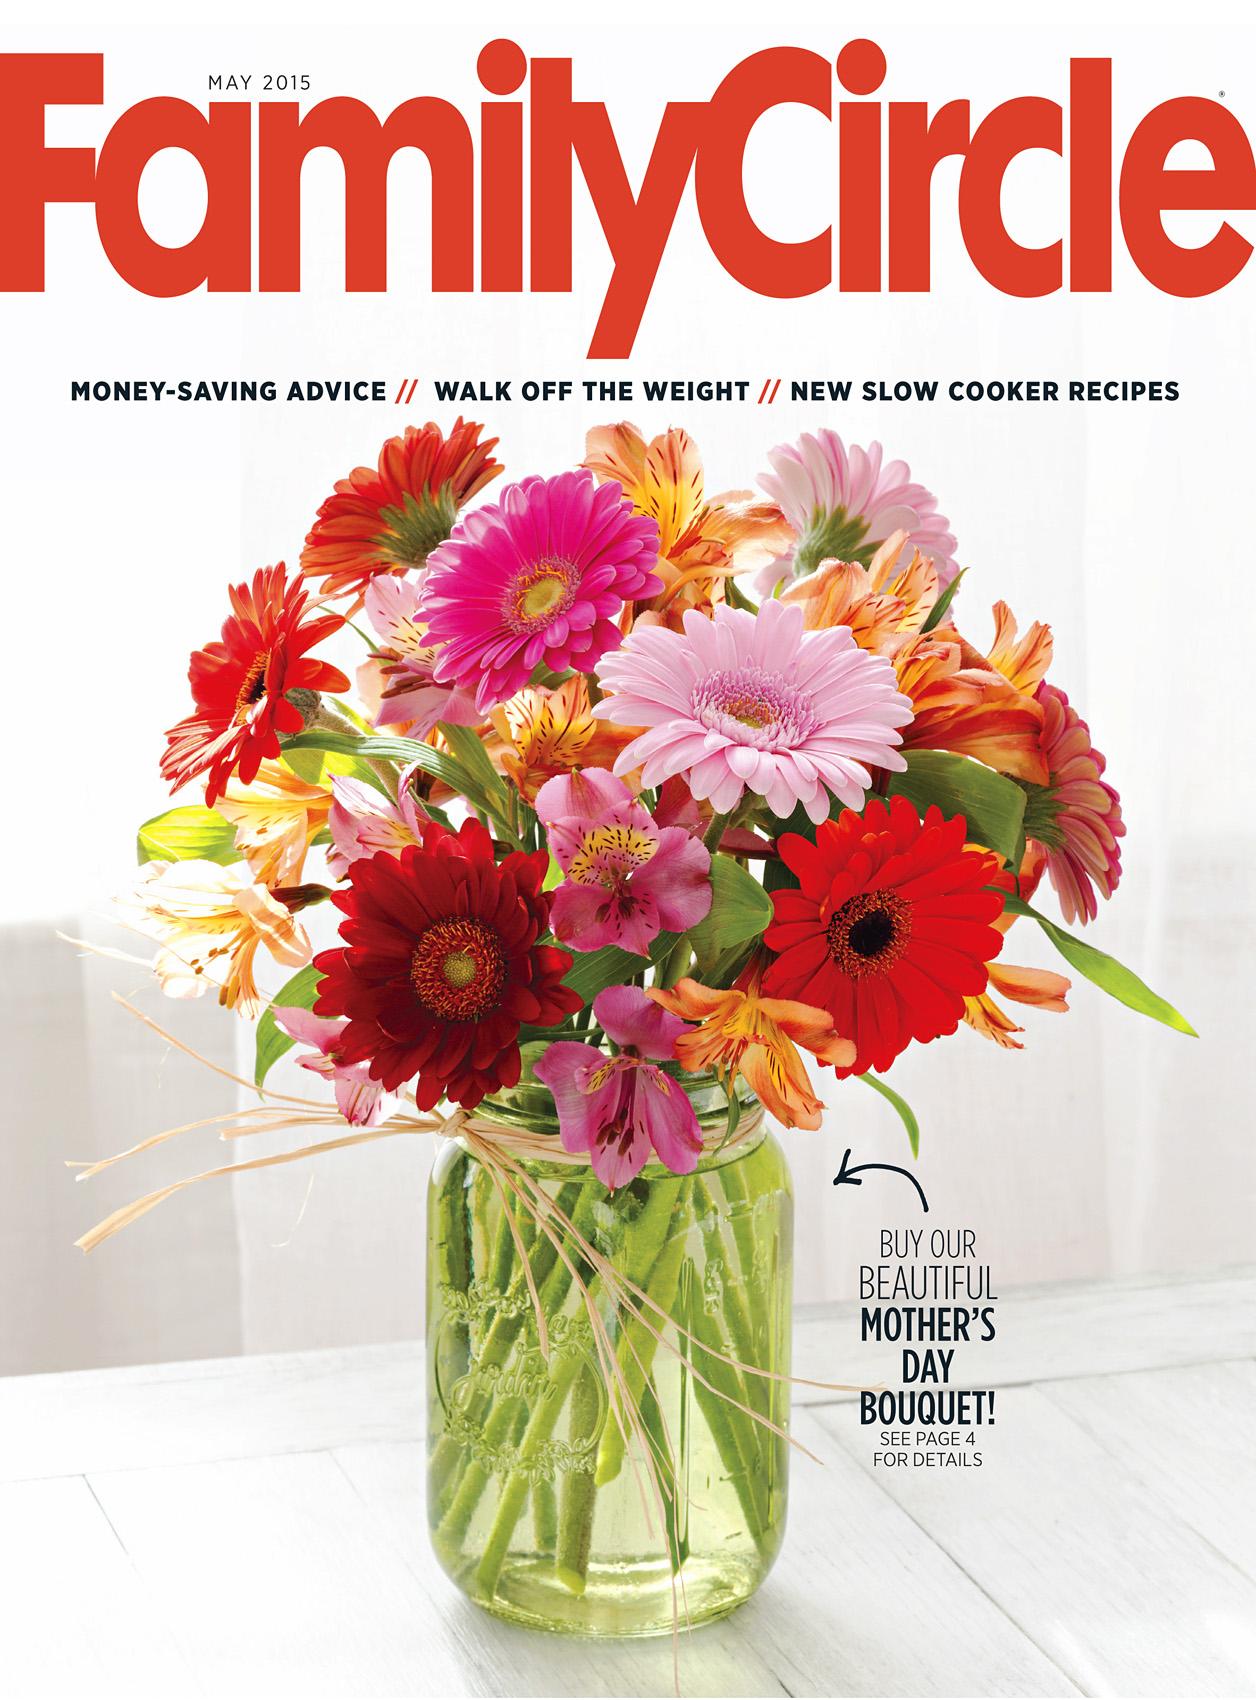 ChristopherWhite_FamilyCircle_May_2015_cover.jpg